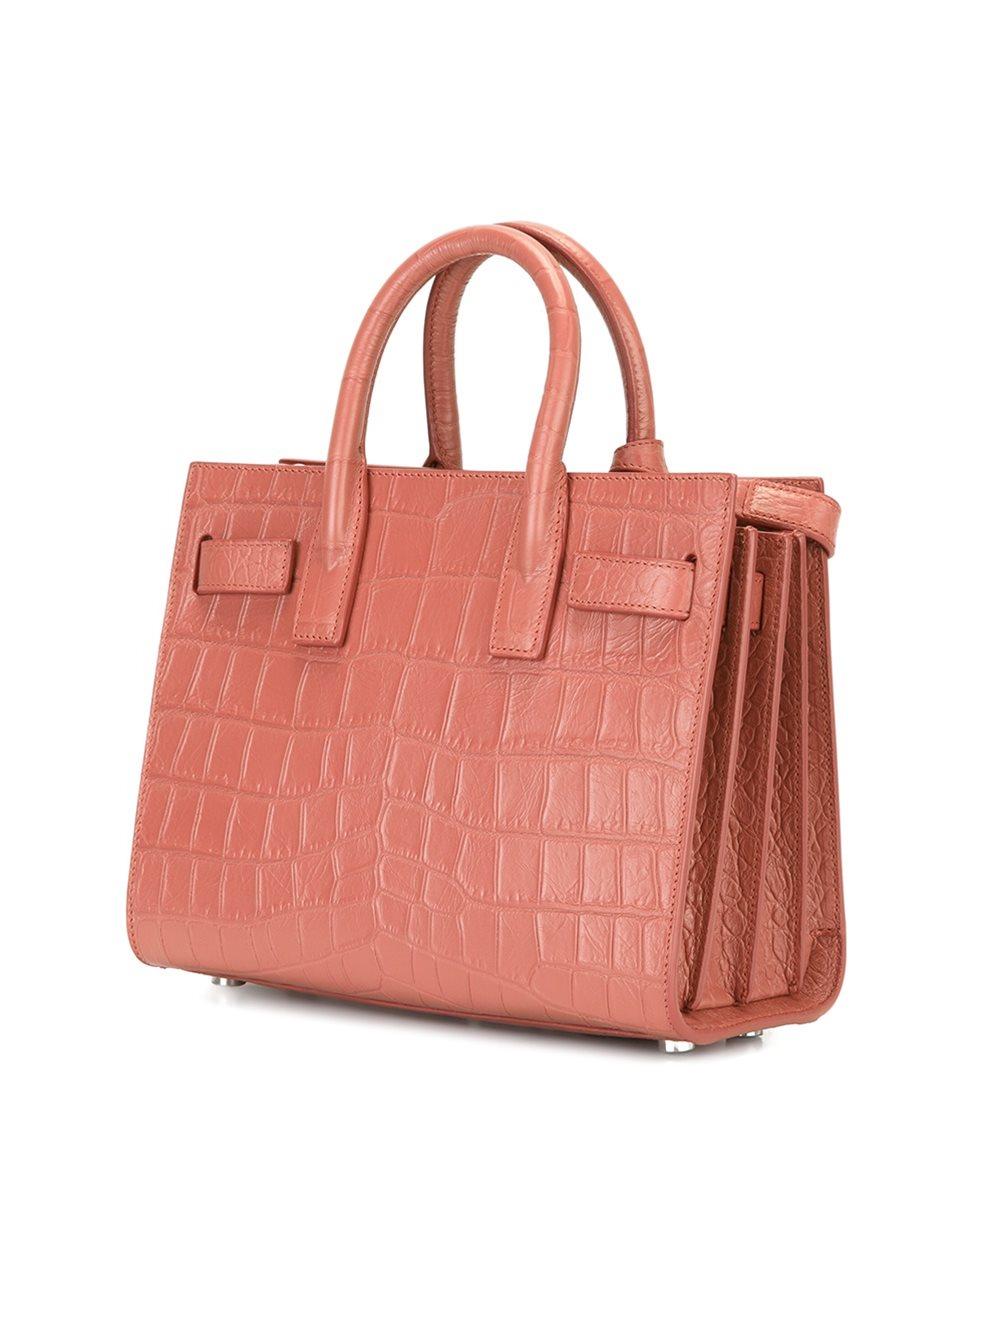 saint laurent nano sac de jour tote bag in pink lyst. Black Bedroom Furniture Sets. Home Design Ideas